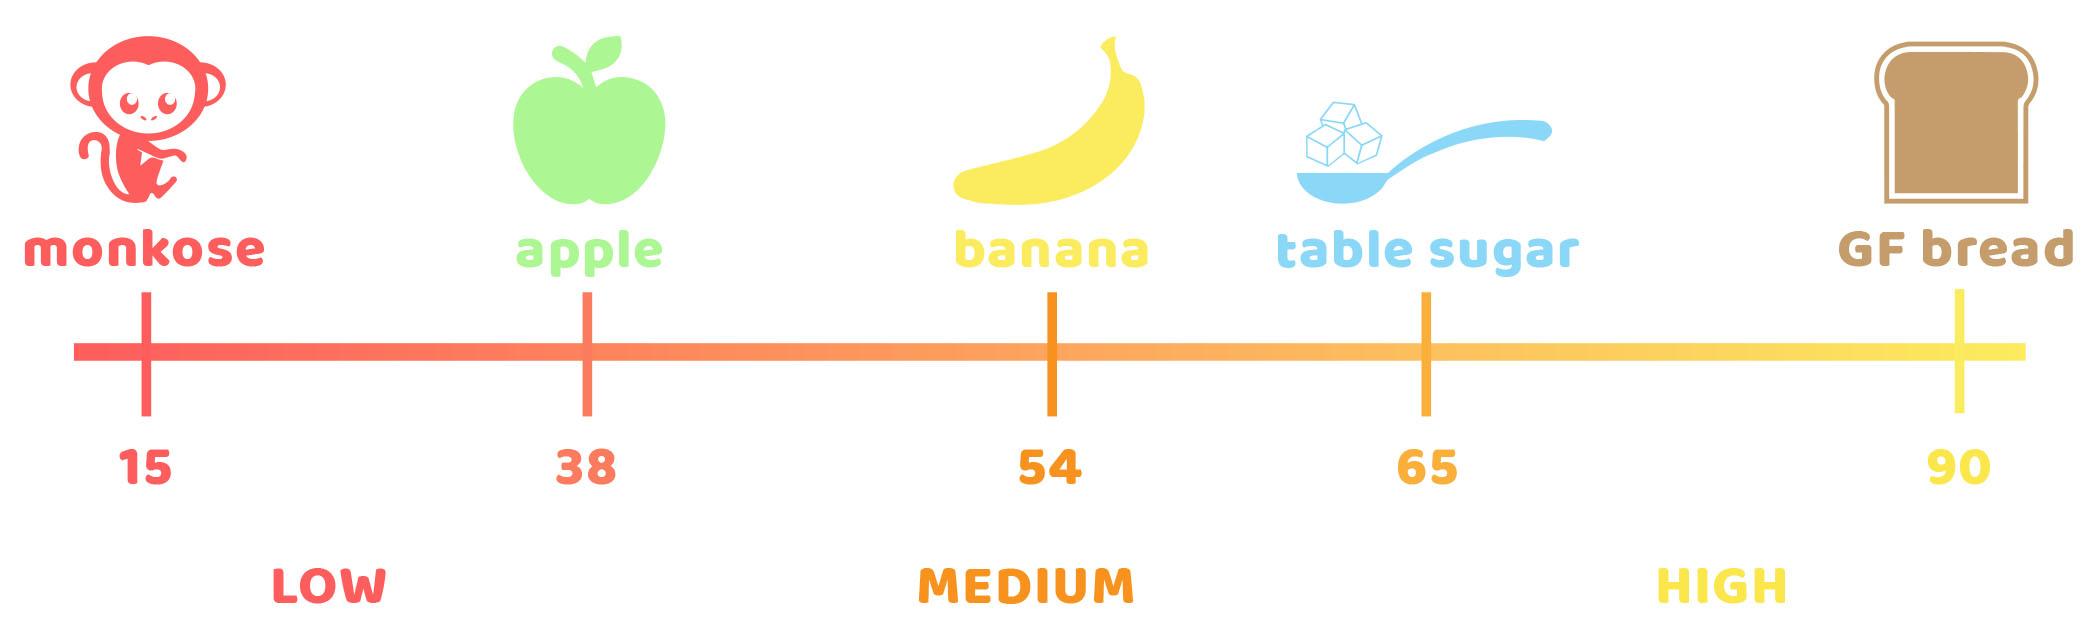 Monkose_glucose scale.jpg